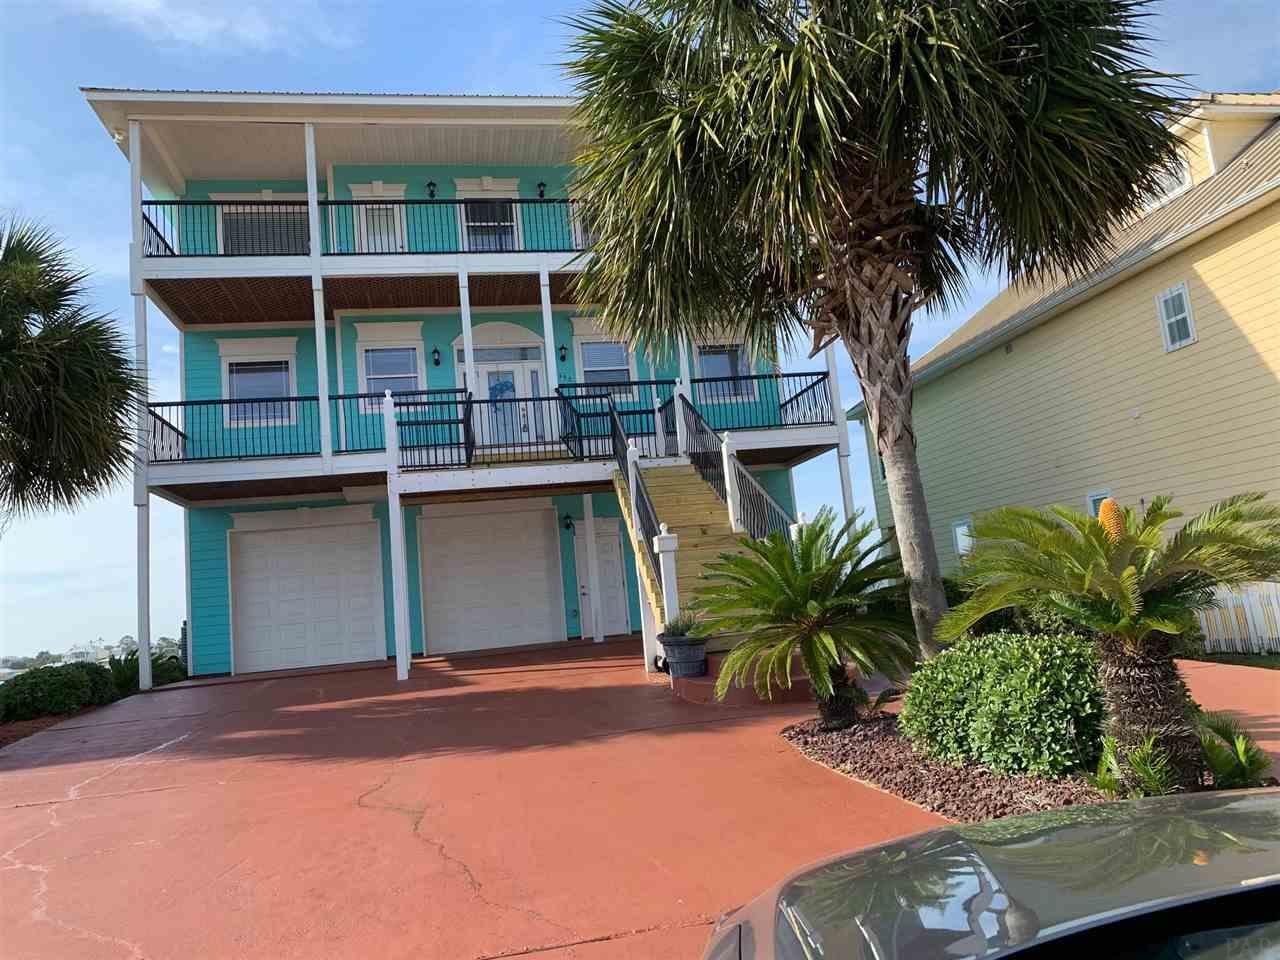 353 GULFVIEW LN, Perdido Key, Florida